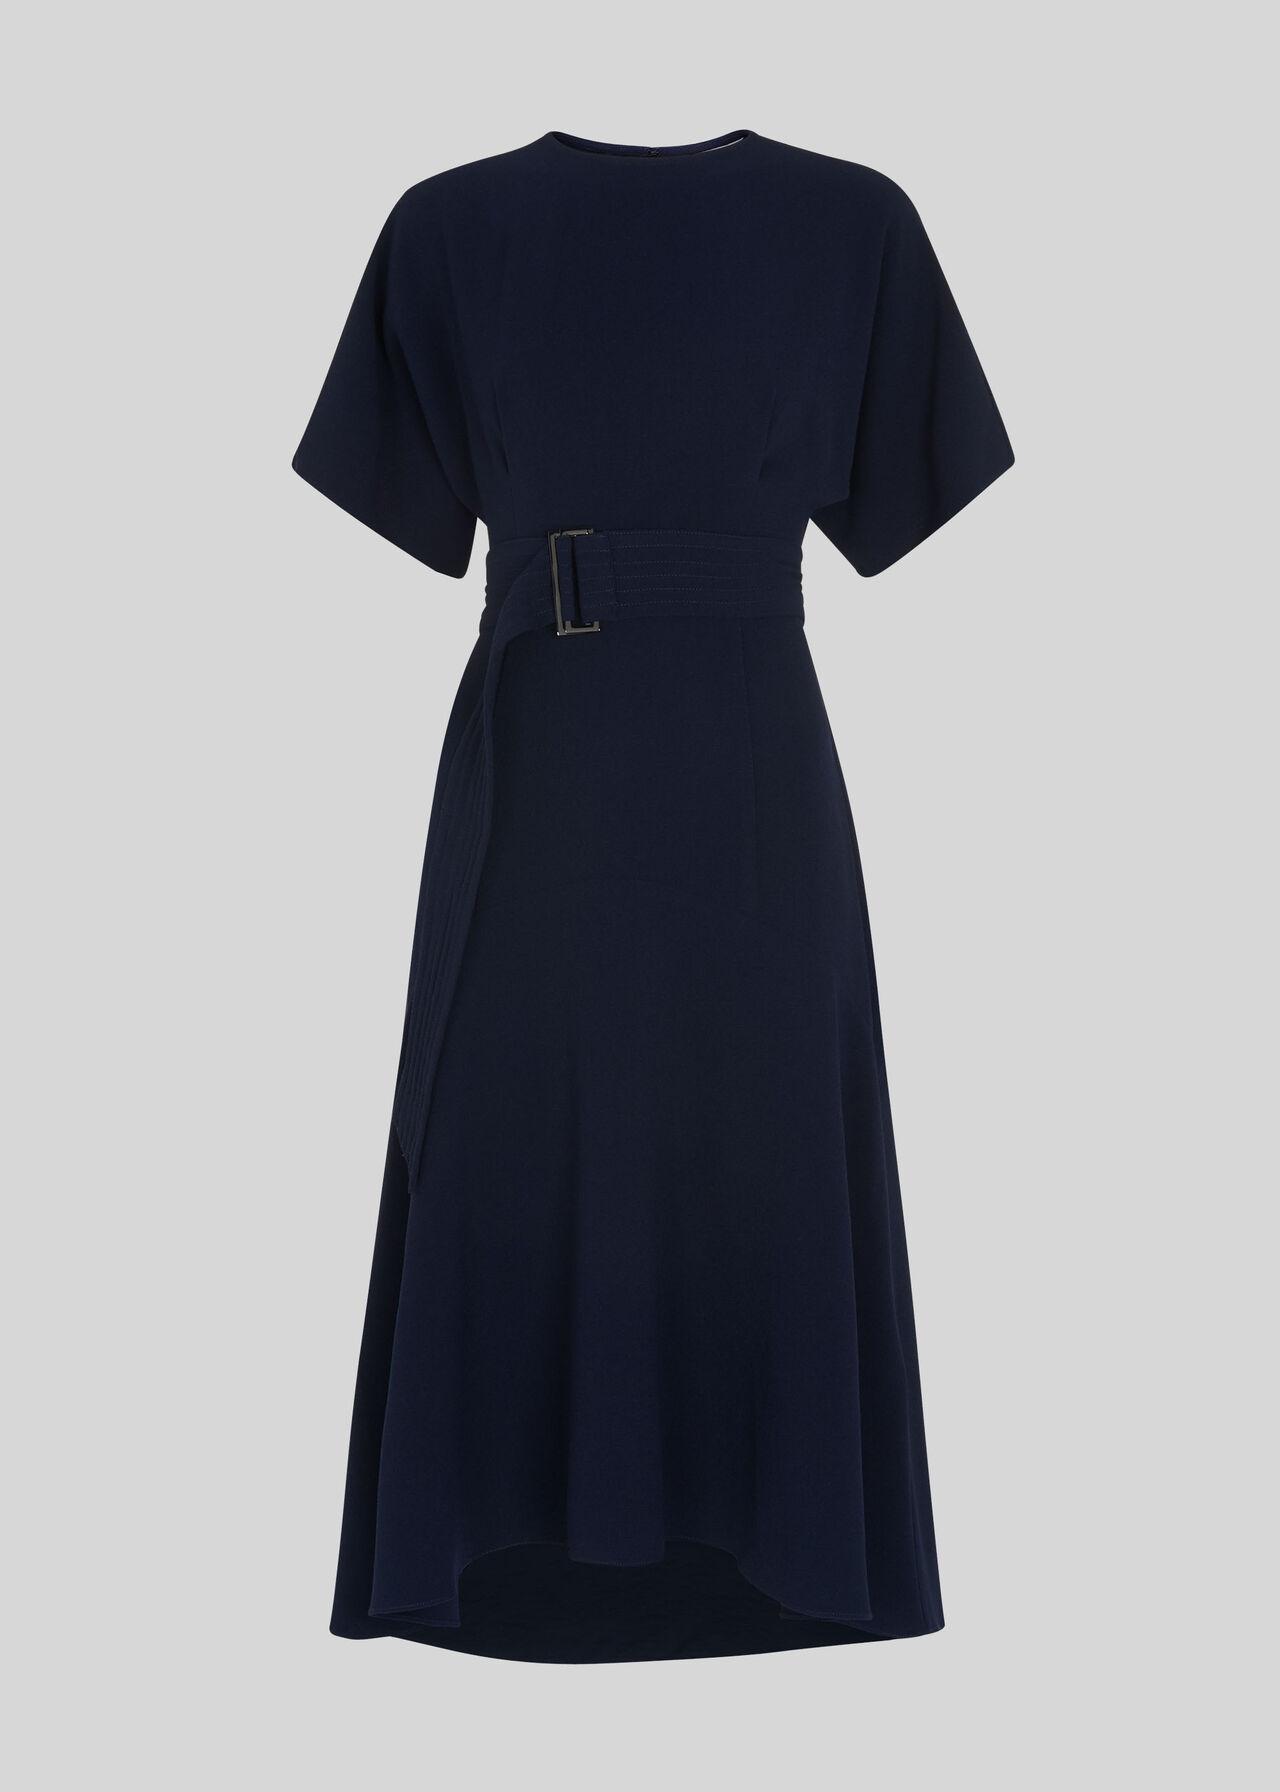 Belted Midi Dress Navy